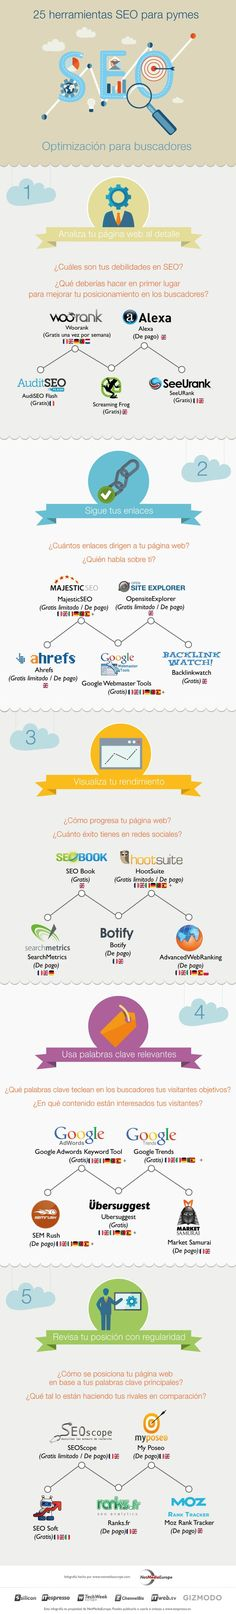 infografia con herramientas para SEO